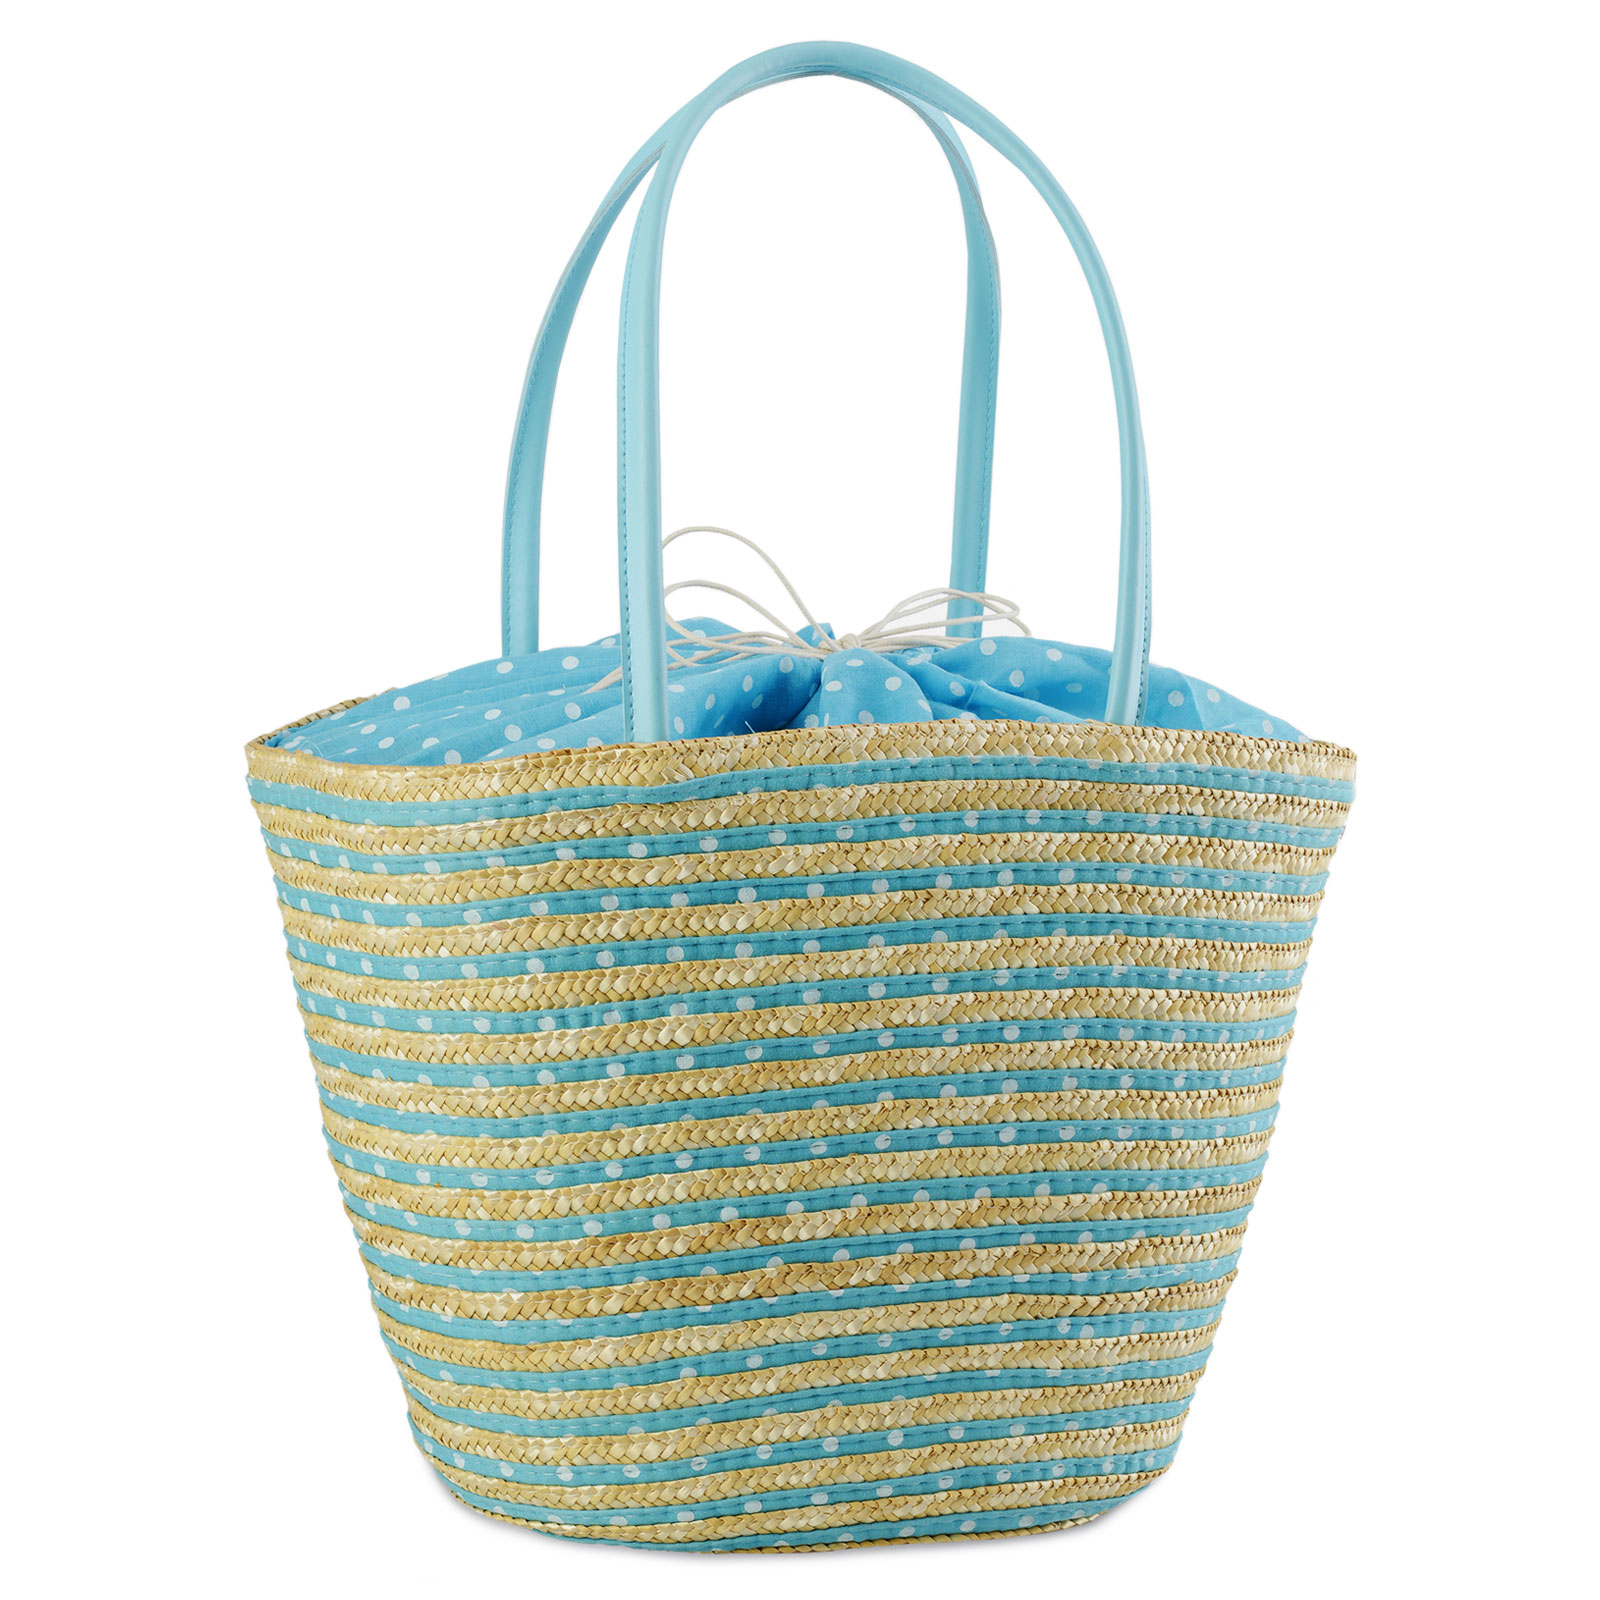 MQ-00136-G16-P-sac-cabas-plage-paille-turquoise